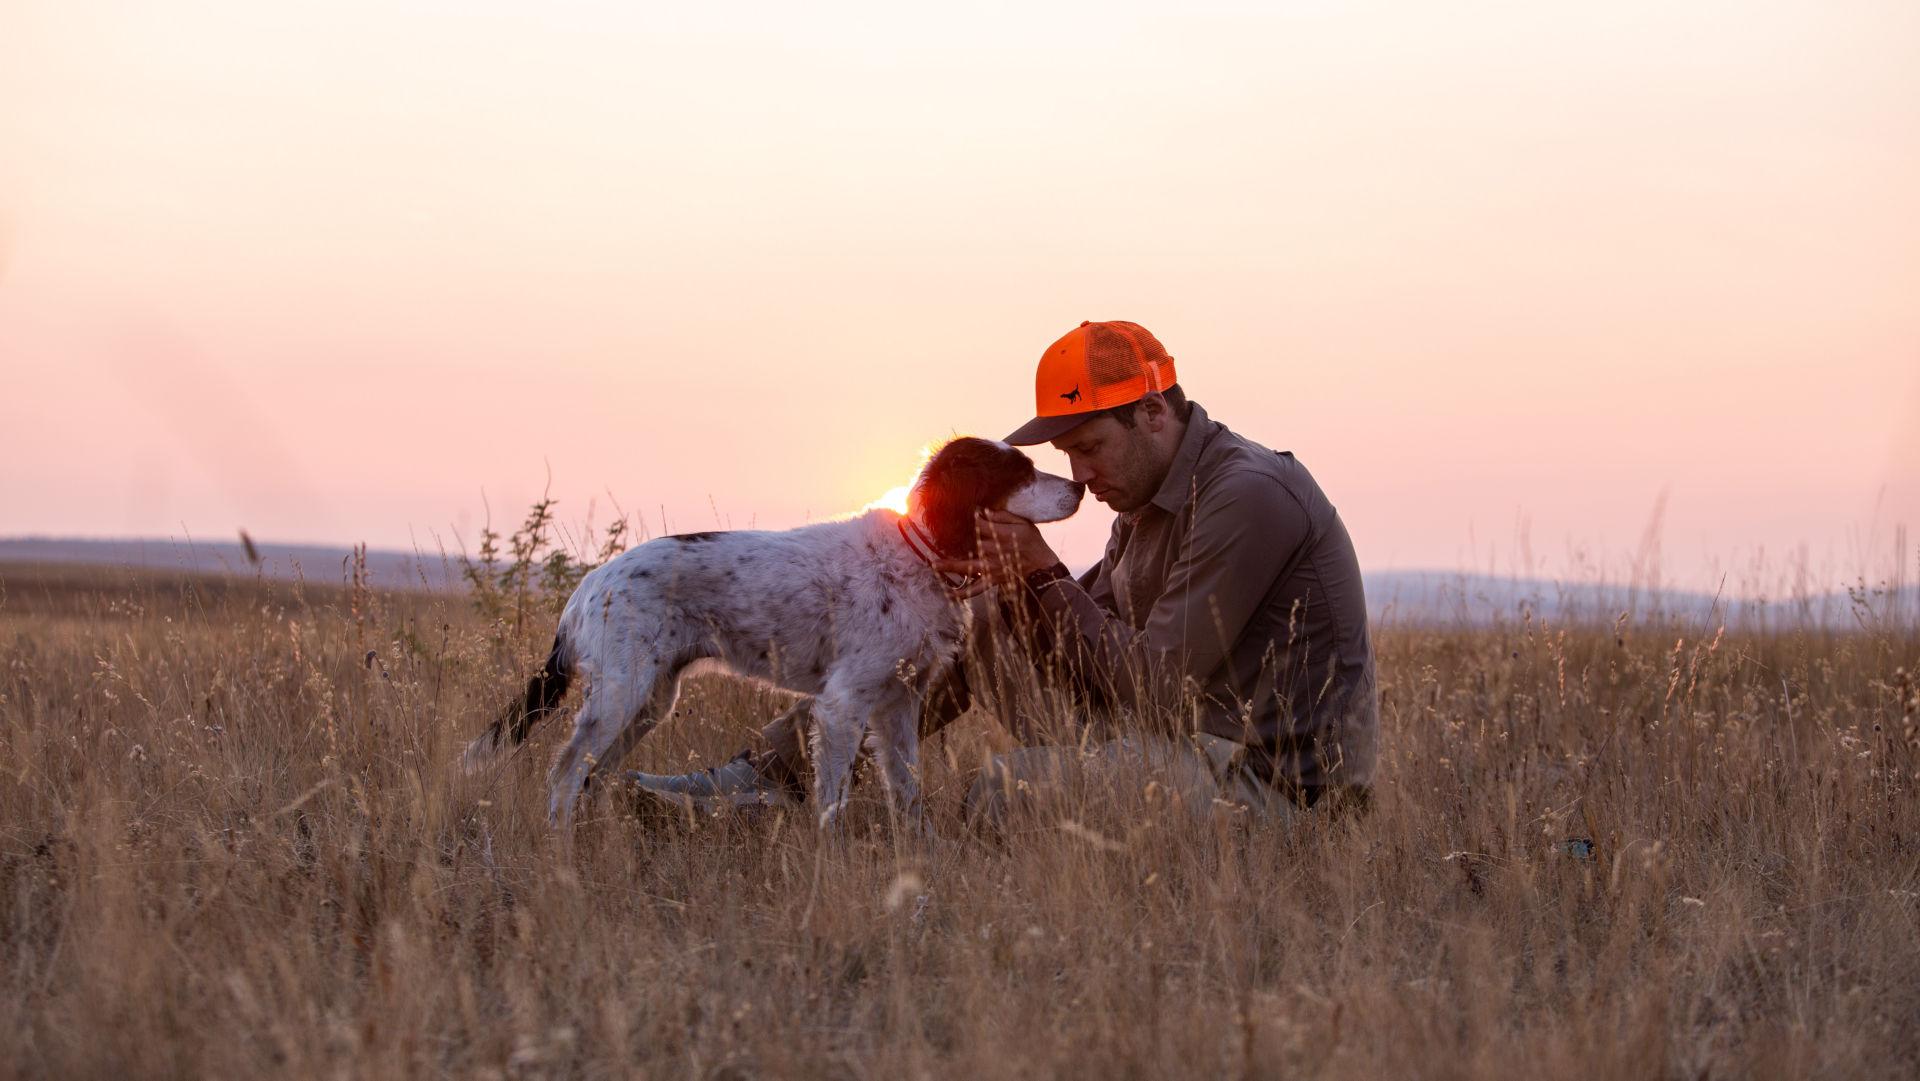 Simon Perkins with his dog Copa.